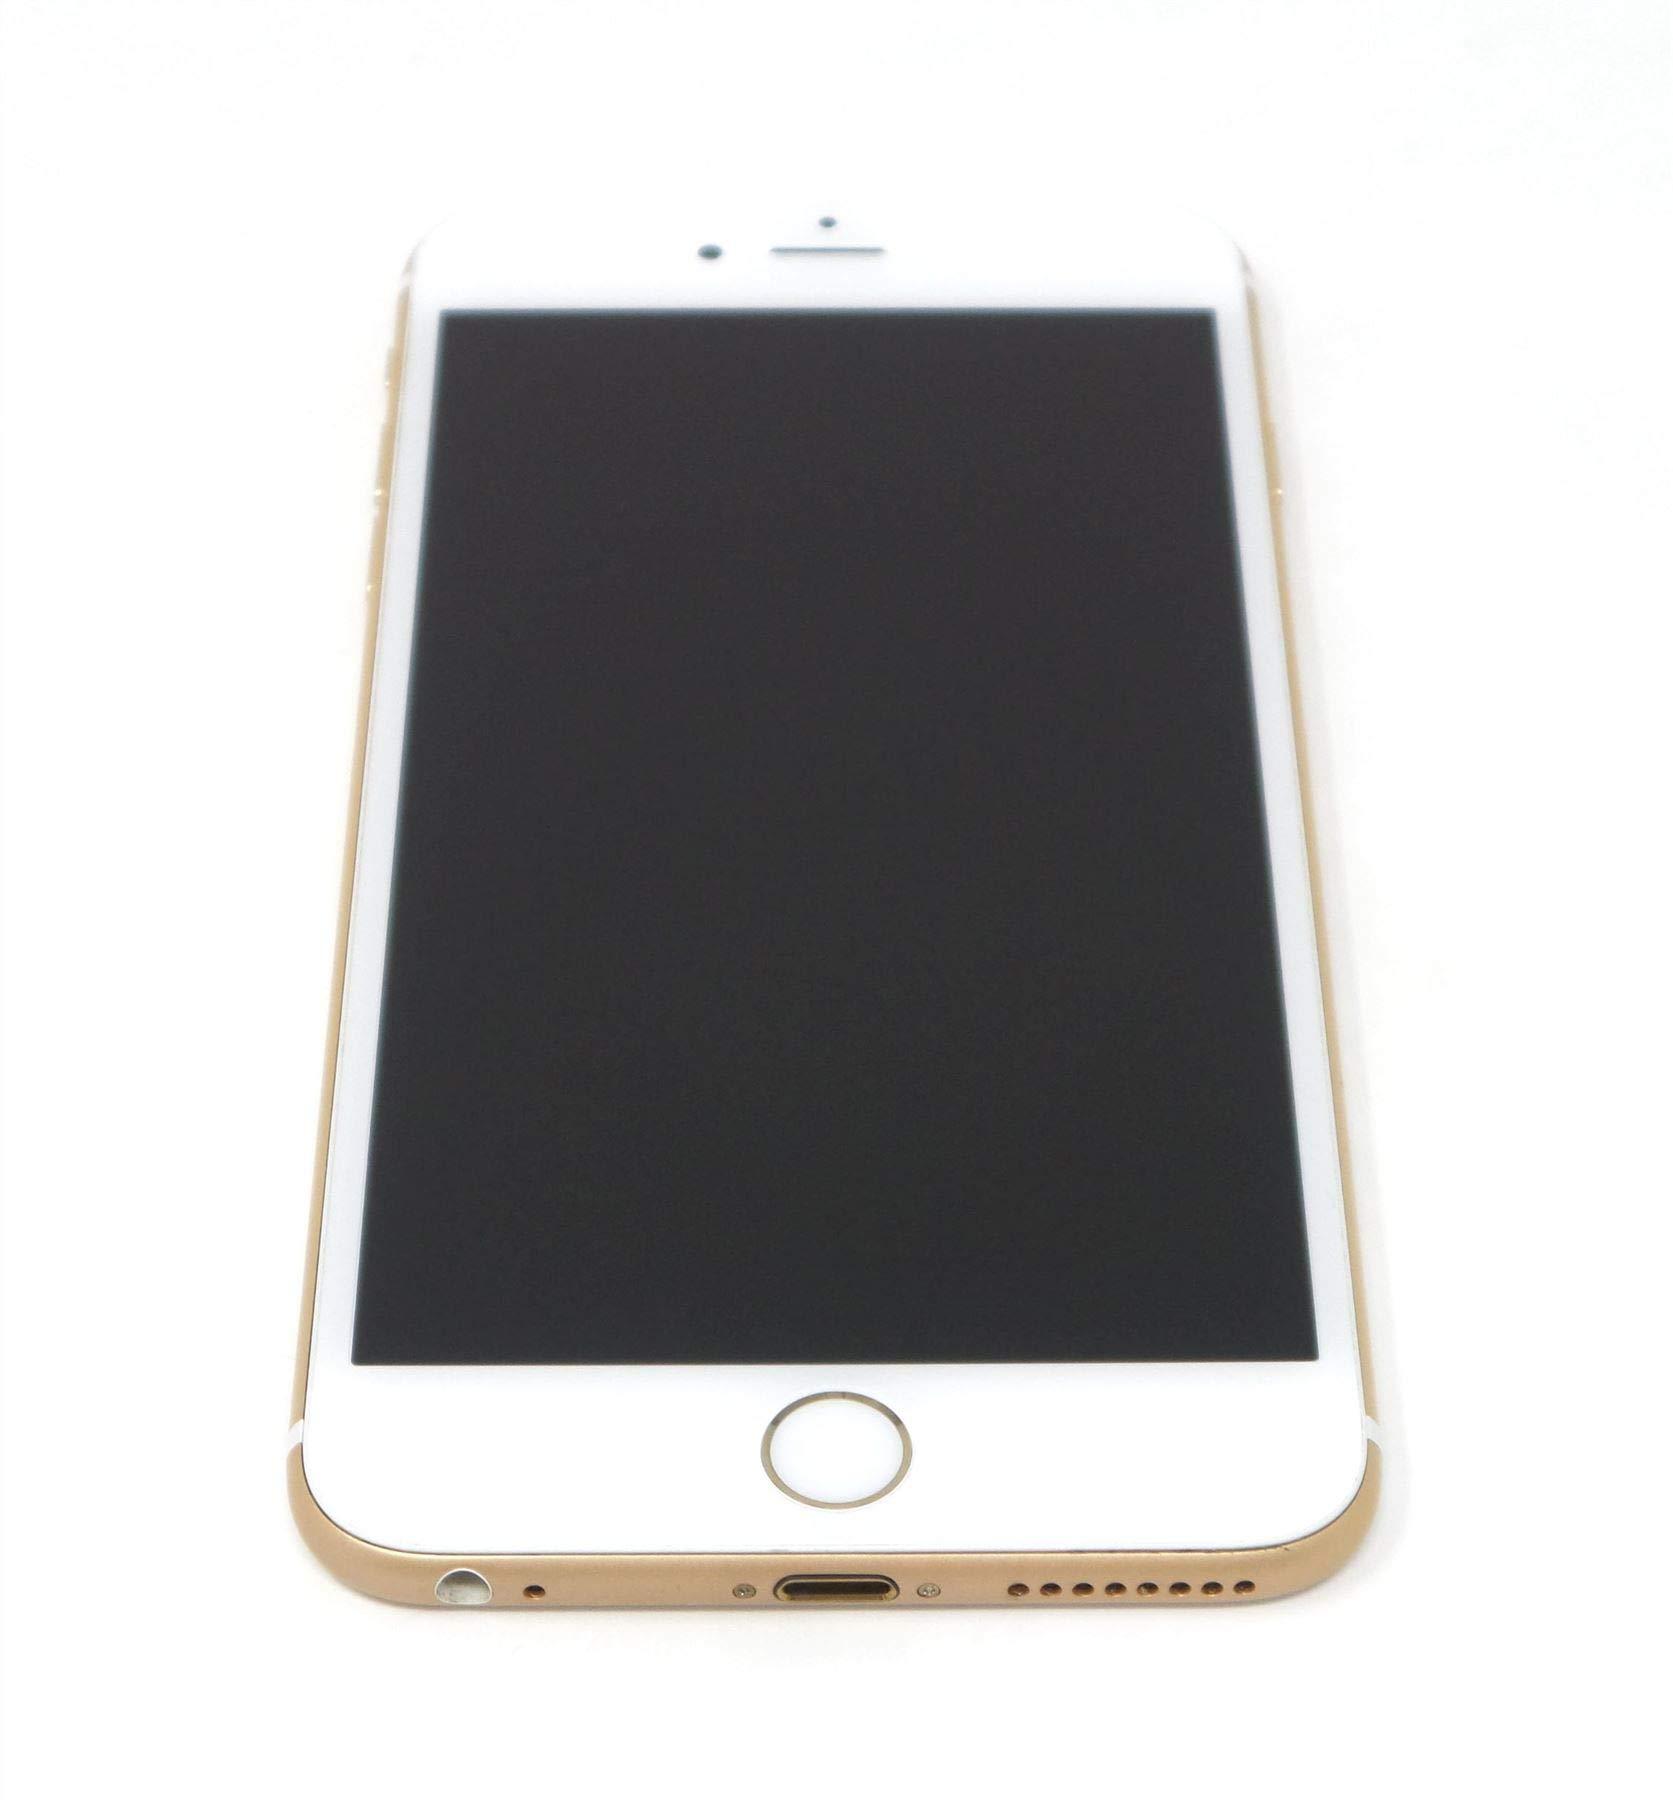 Apple iPhone 6S Plus, 32GB, Gold - Fully Unlocked (Renewed)